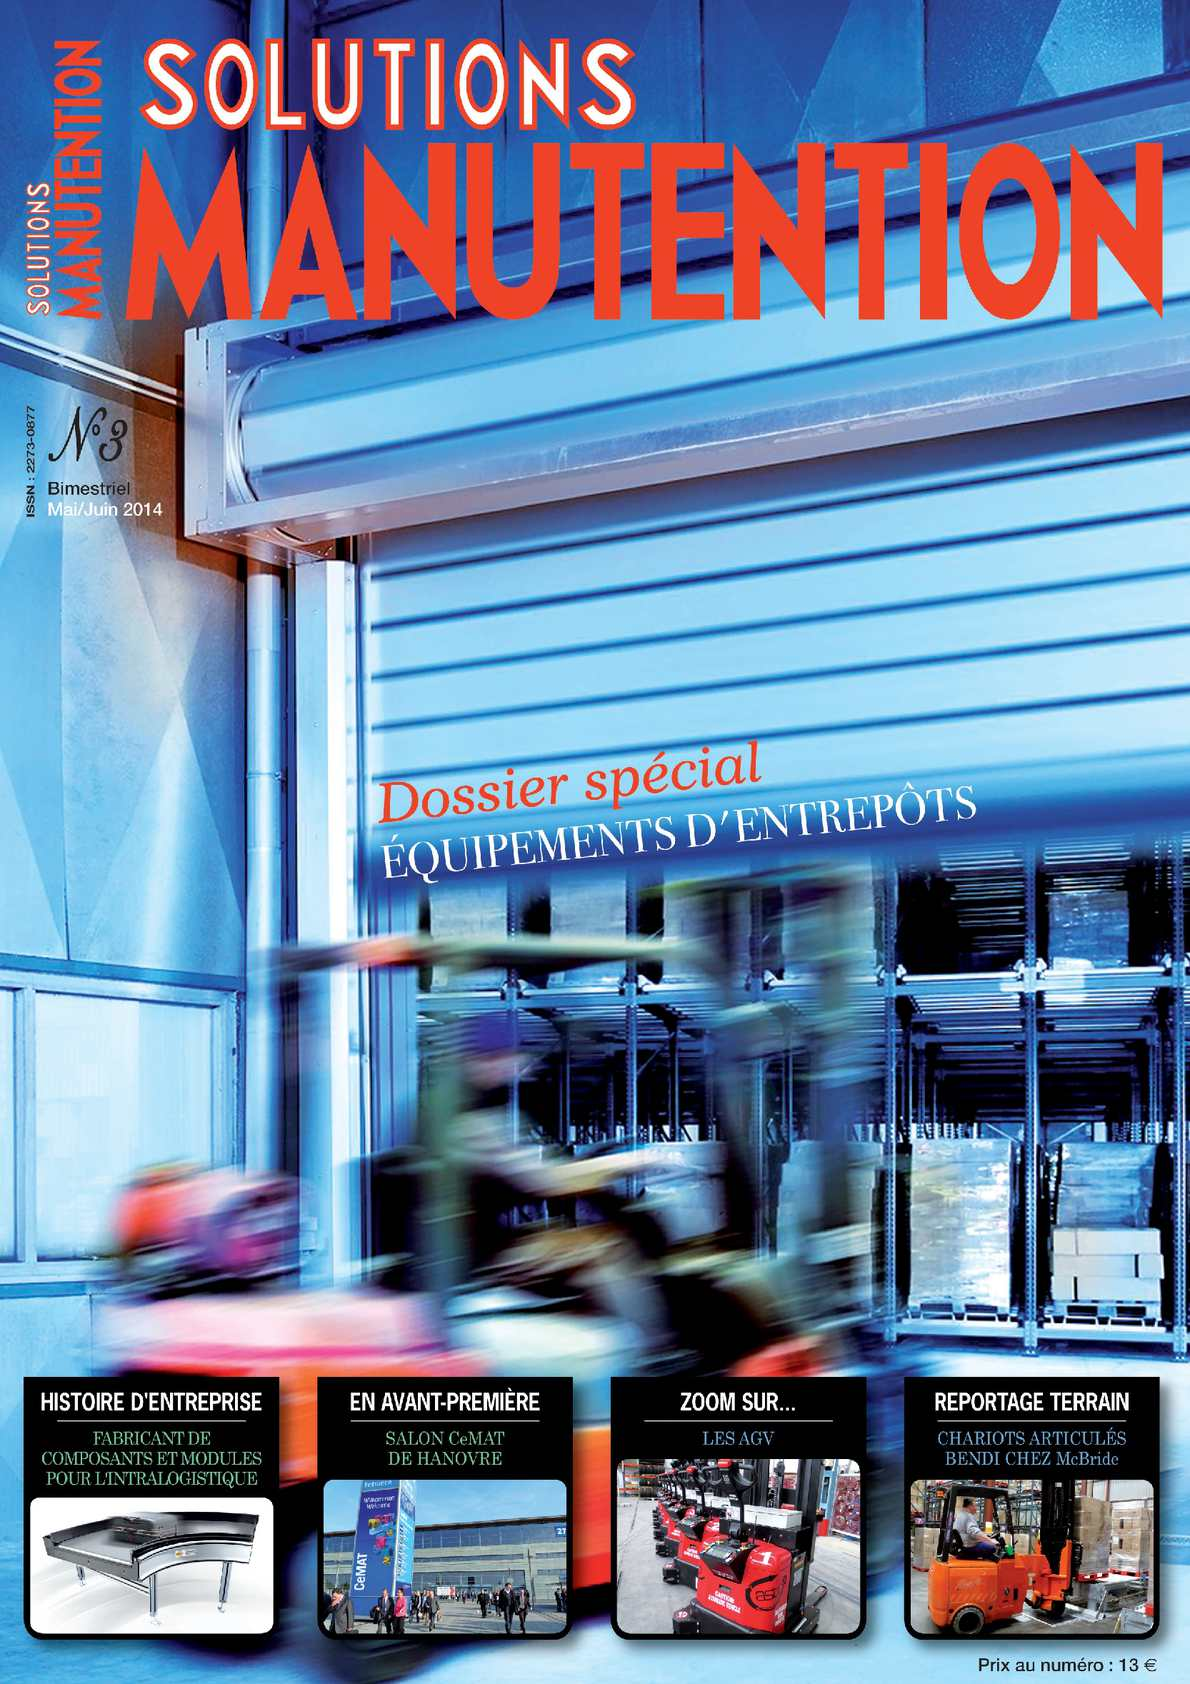 Calam o solutions manutention n 3 for Salon de la manutention